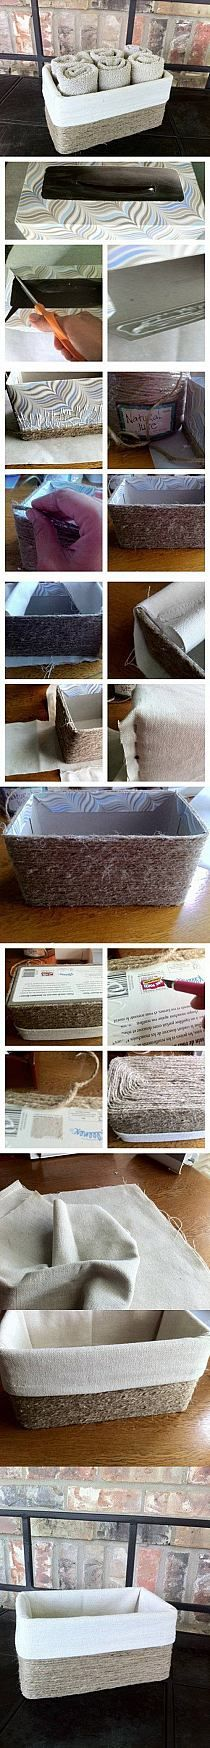 DIY Jute Basket from Cardboard Box DIY Jute Basket from Cardboard Box by diyforever Home Crafts, Fun Crafts, Diy And Crafts, Cardboard Box Diy, Ideias Diy, Diy Storage, Decorative Storage, Storage Boxes, Clothes Storage